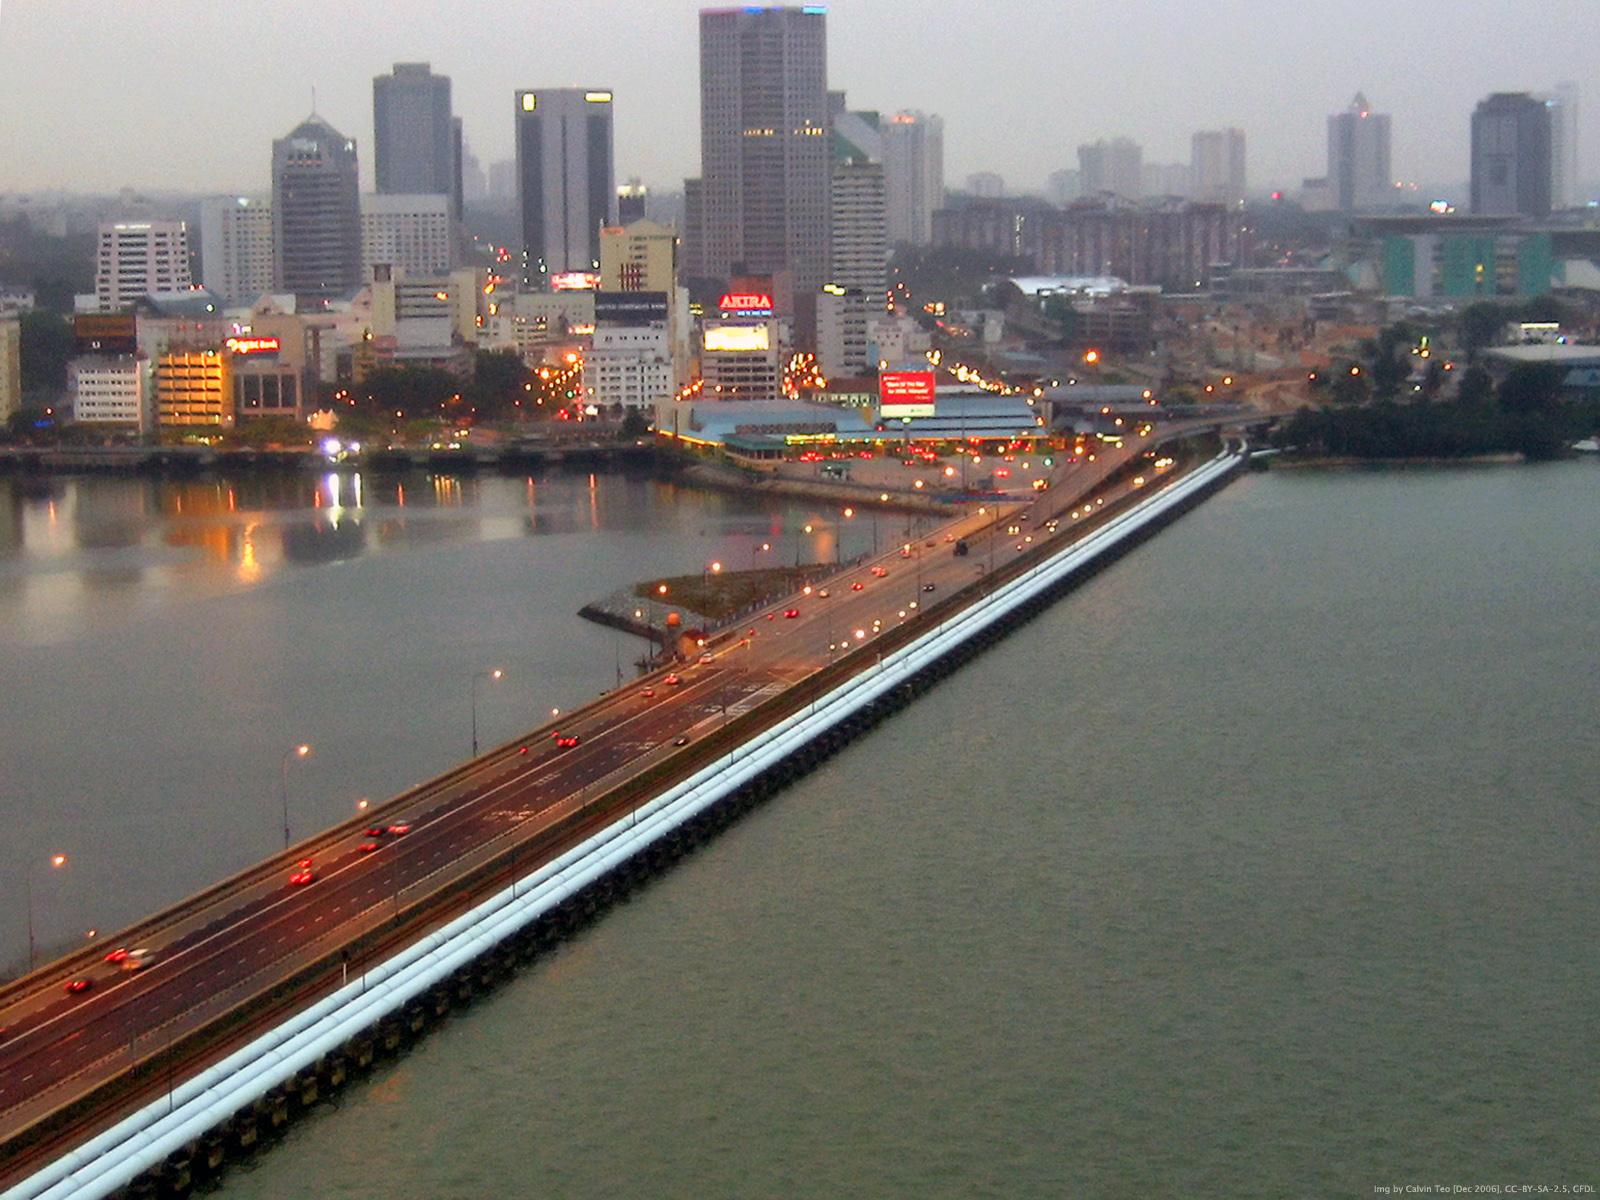 Singapore-Johor causeway. Photo courtesy: Wiki